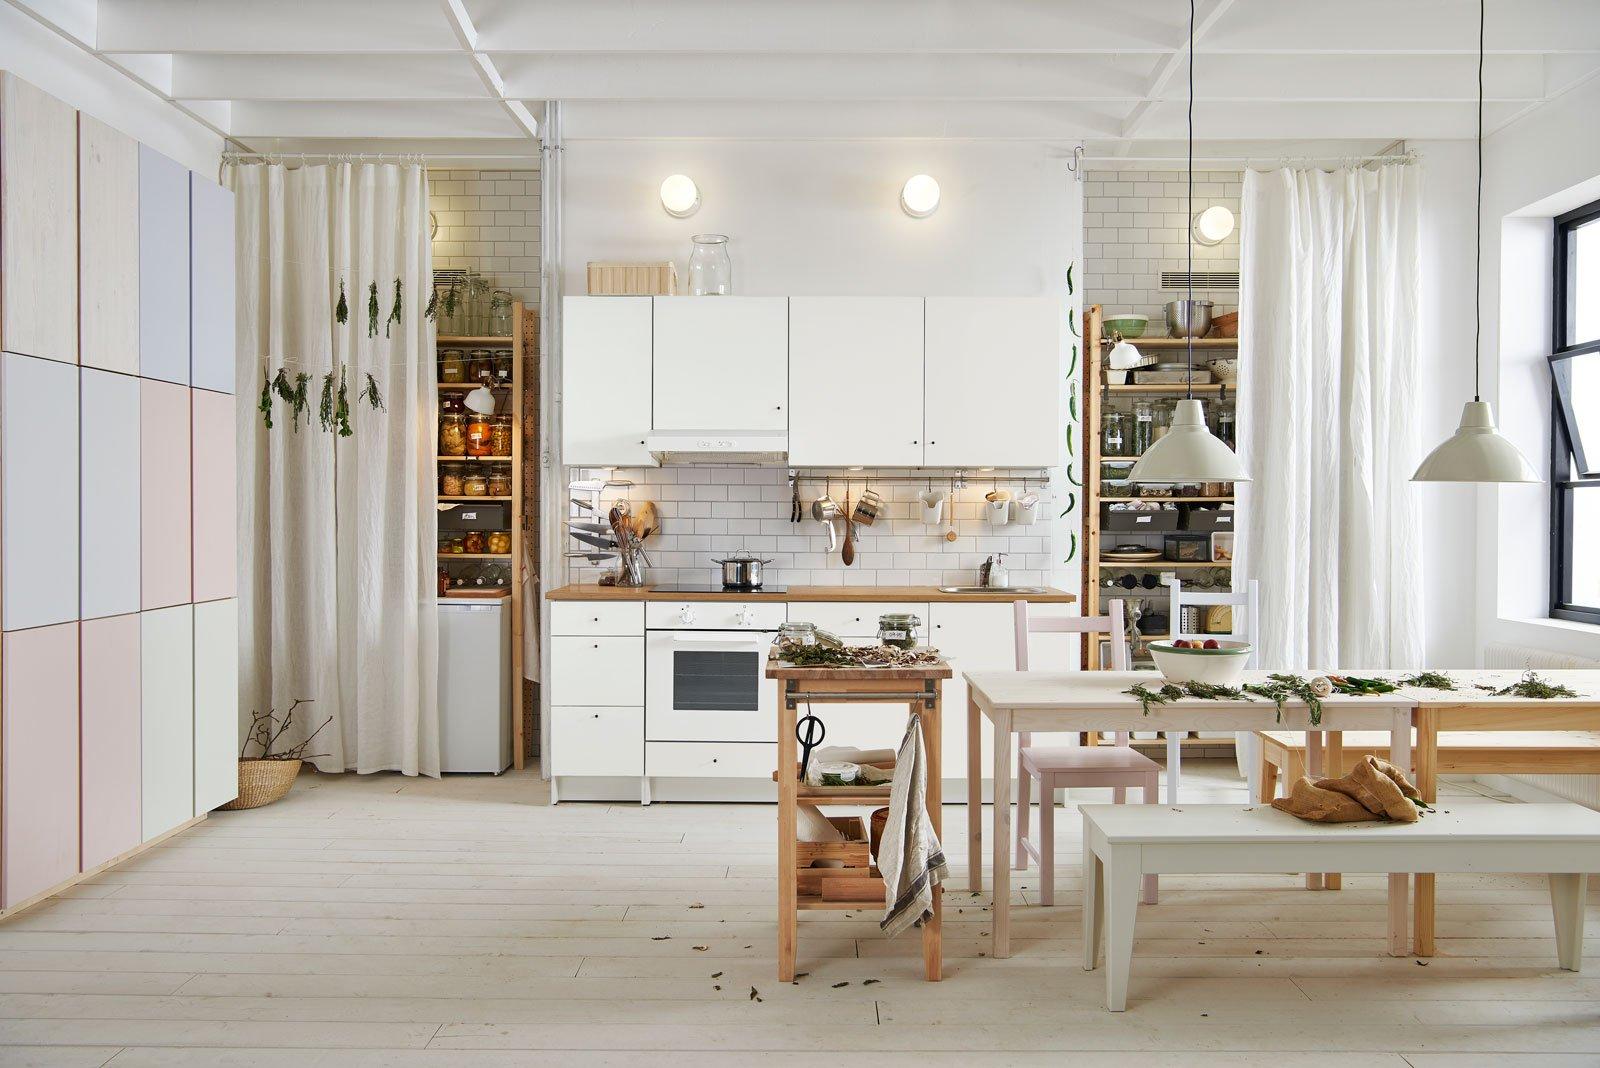 Awesome Cucina Varde Ikea Photos - bakeroffroad.us - bakeroffroad.us